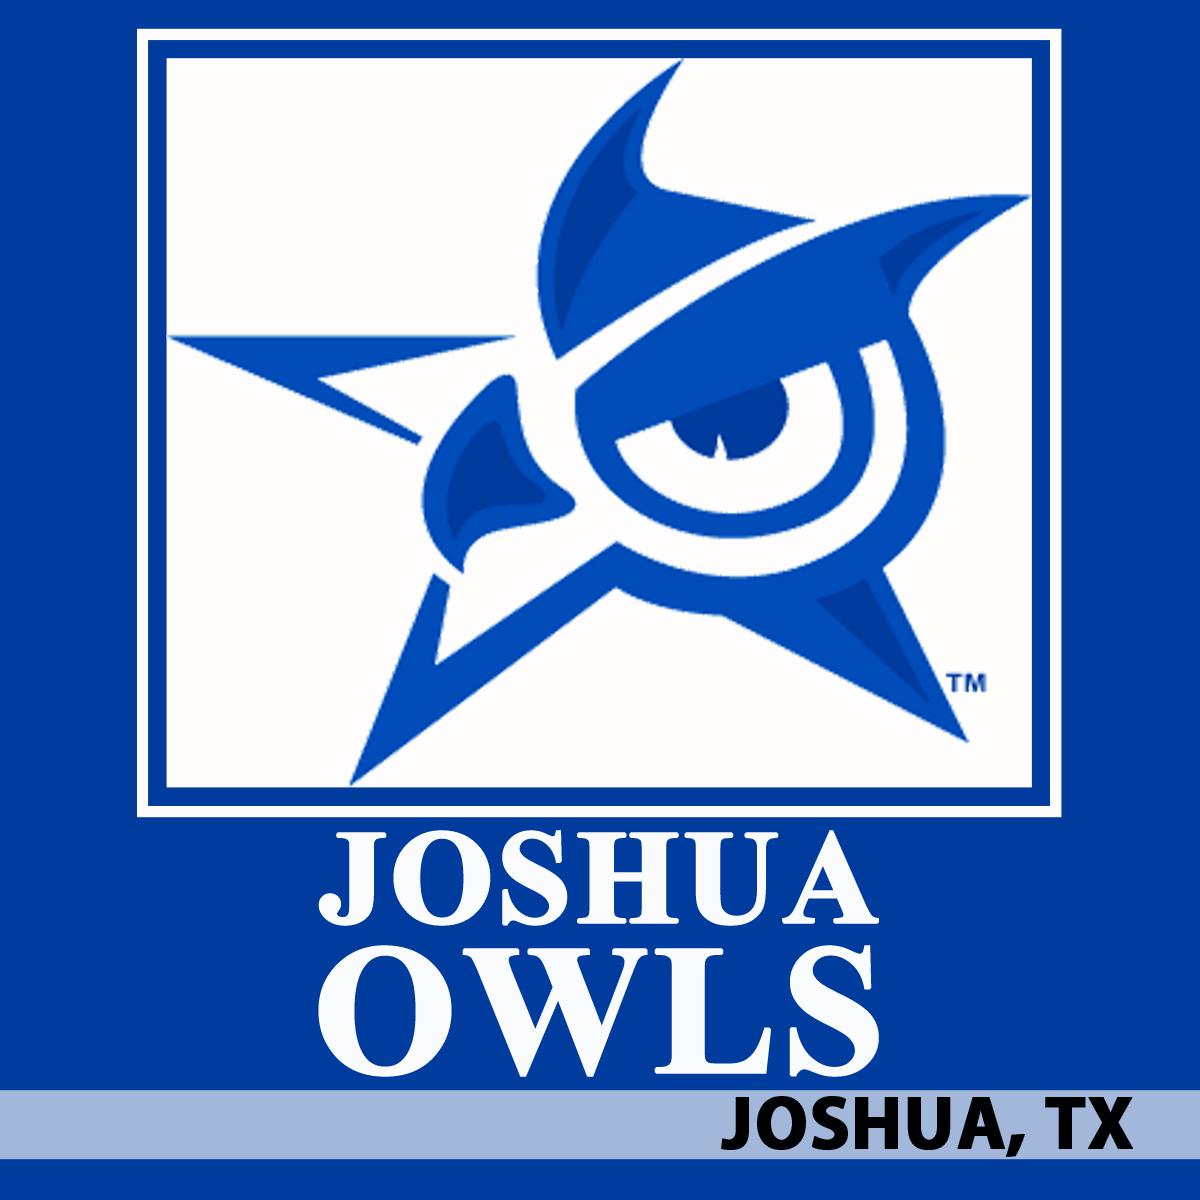 Joshua, TX